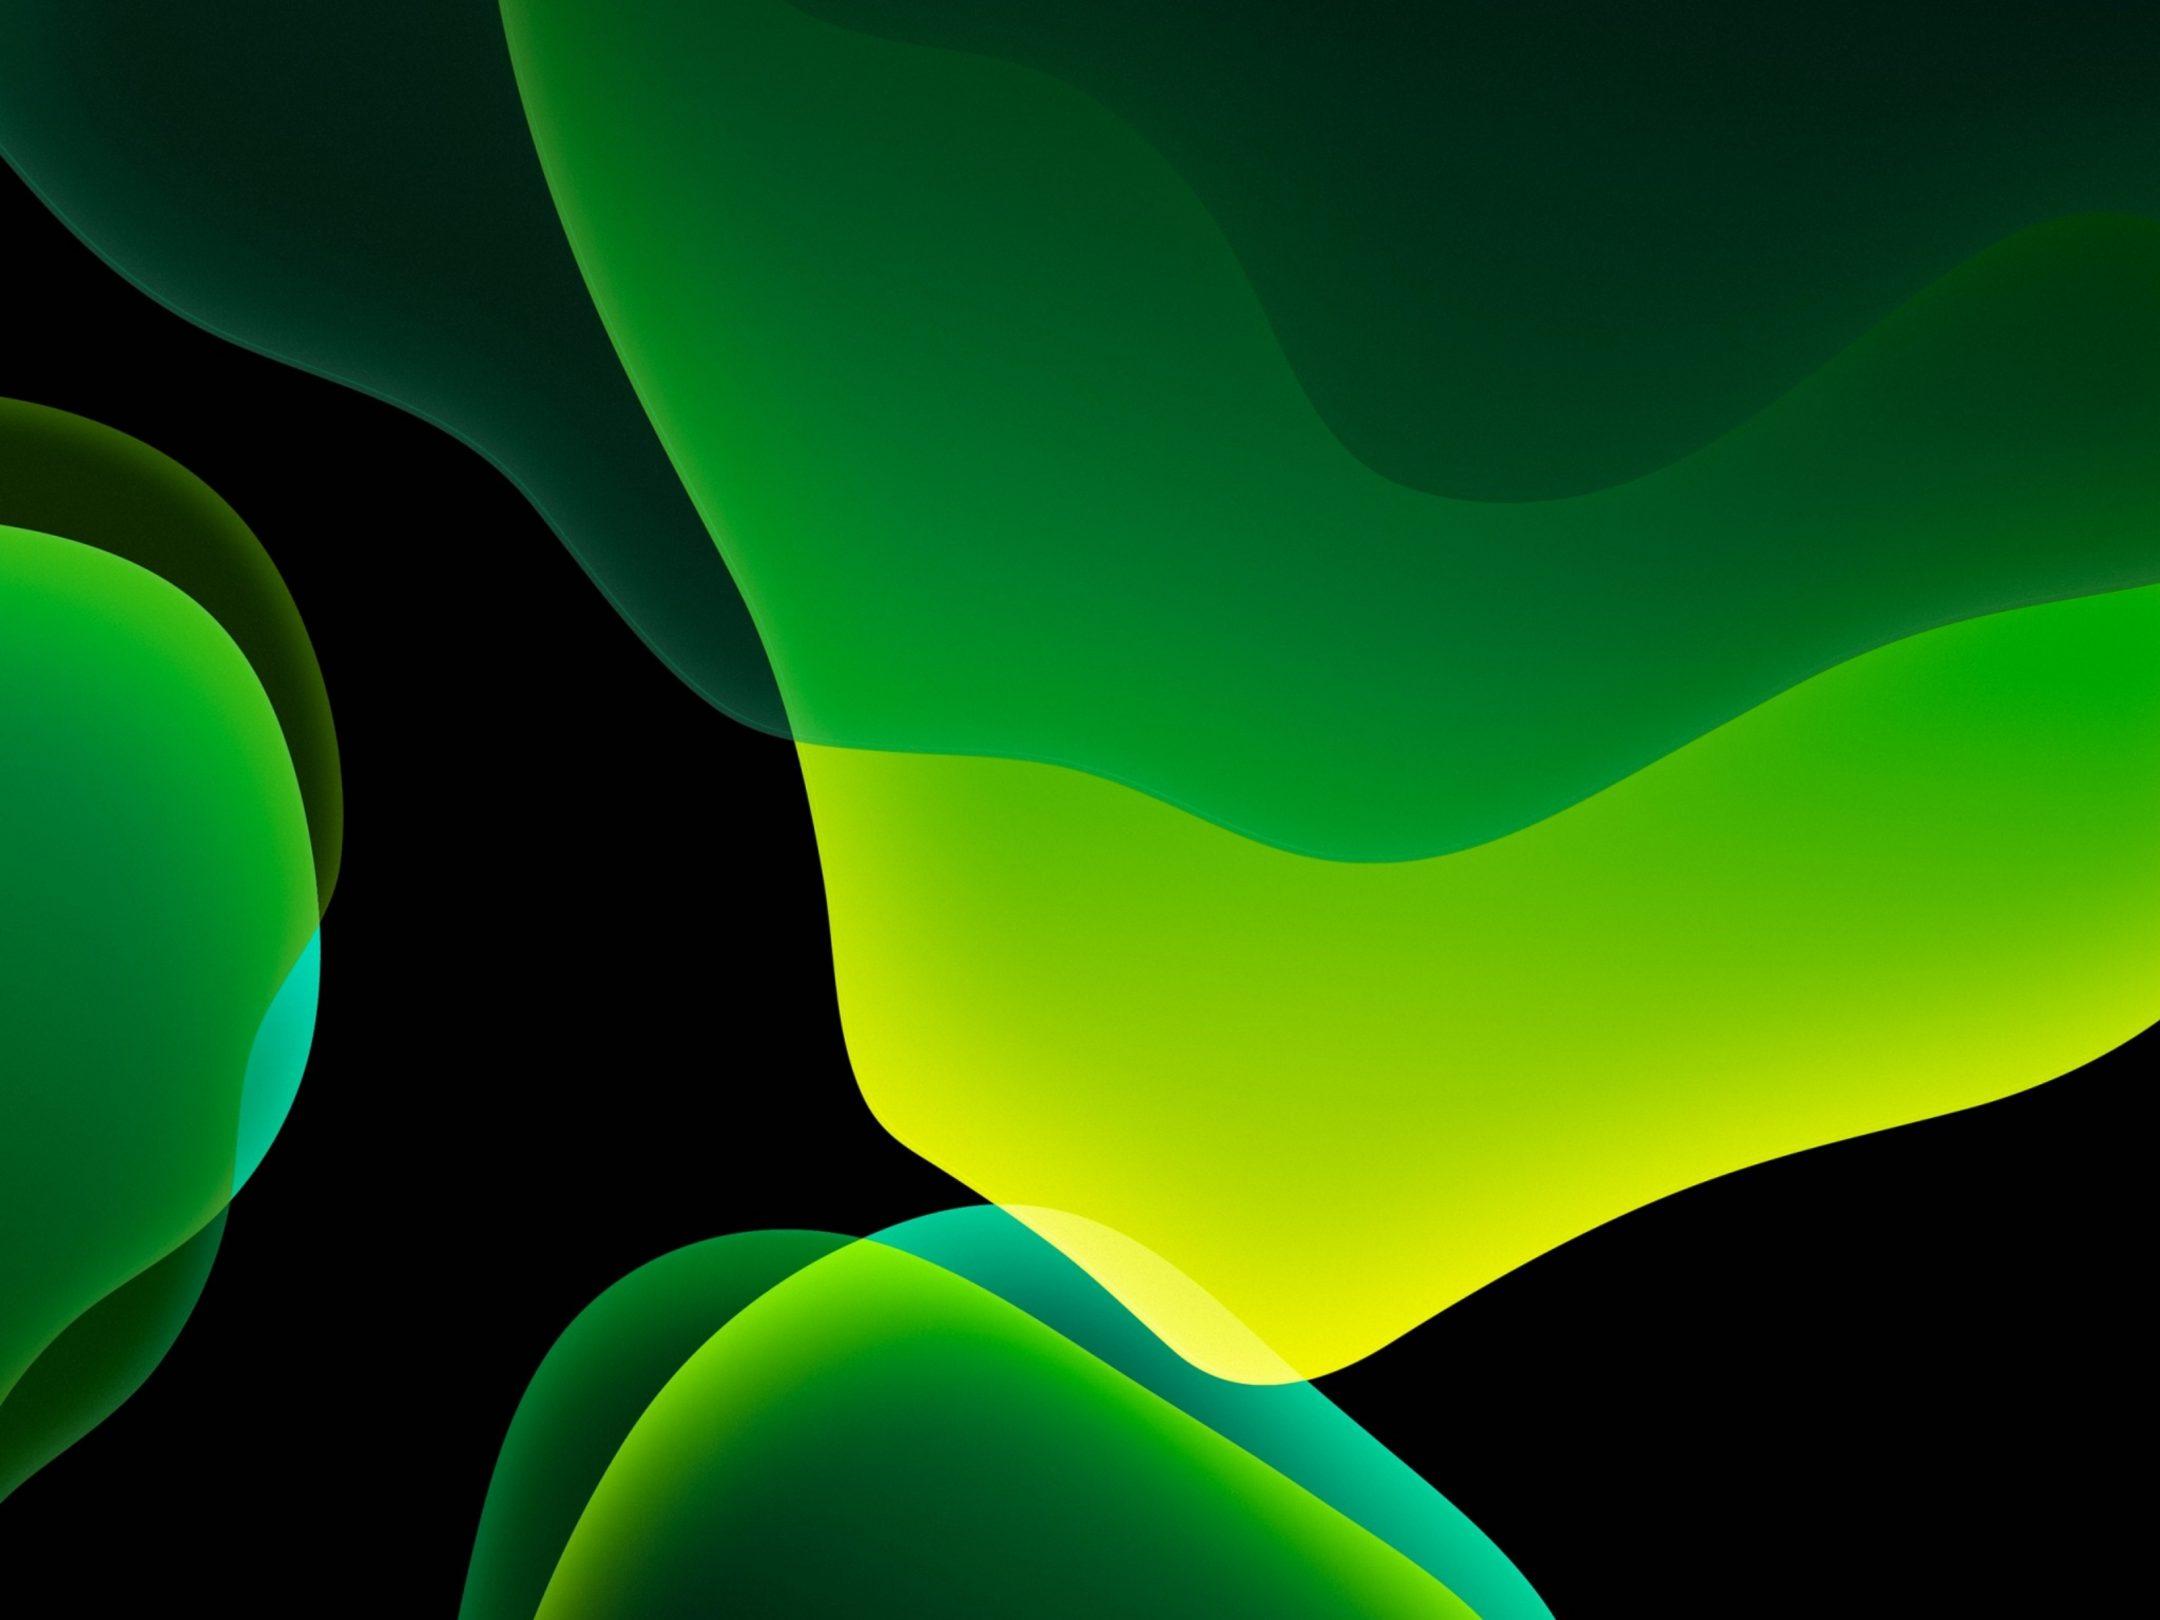 2160x1620 iPad wallpaper 4k Green Dark Ipados Ipad Wallpaper 2160x1620 pixels resolution